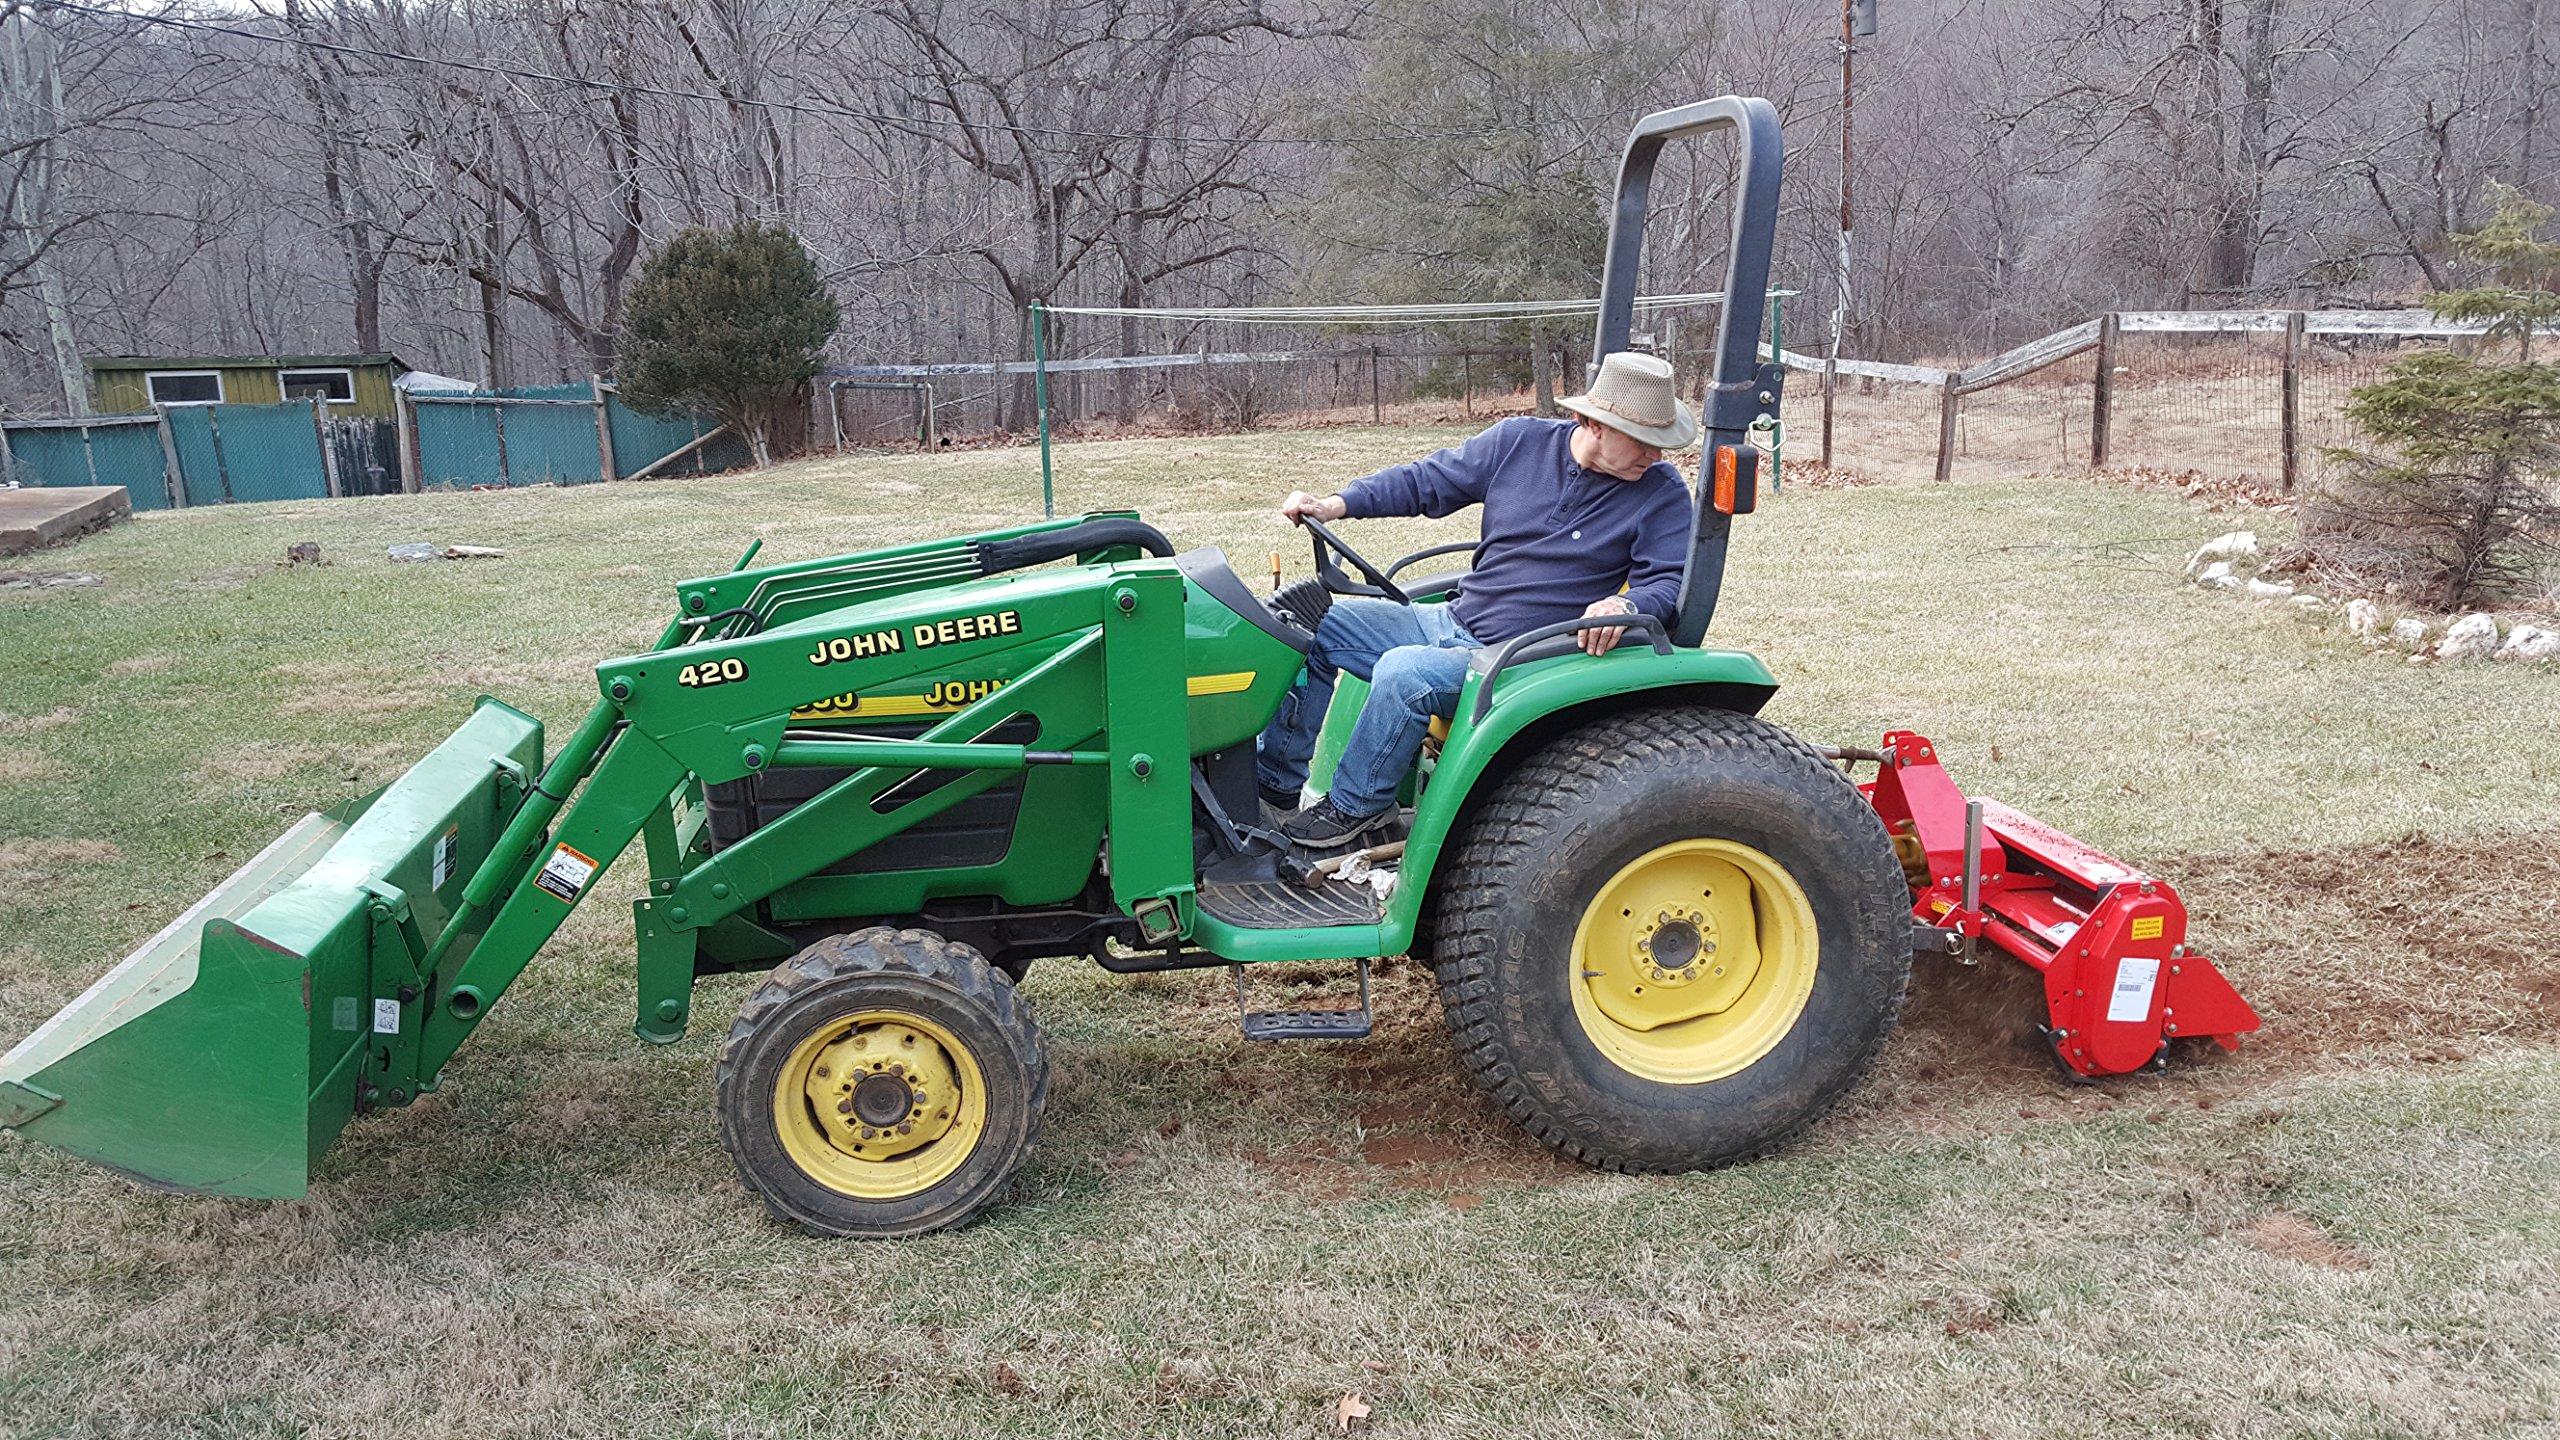 Farmer Helper 48'' Tiller Cat.I 3pt 20+hp (FH-TL125)~Adjustable SideShift & SlipClutchDriveline by Farmer Helper (Image #1)